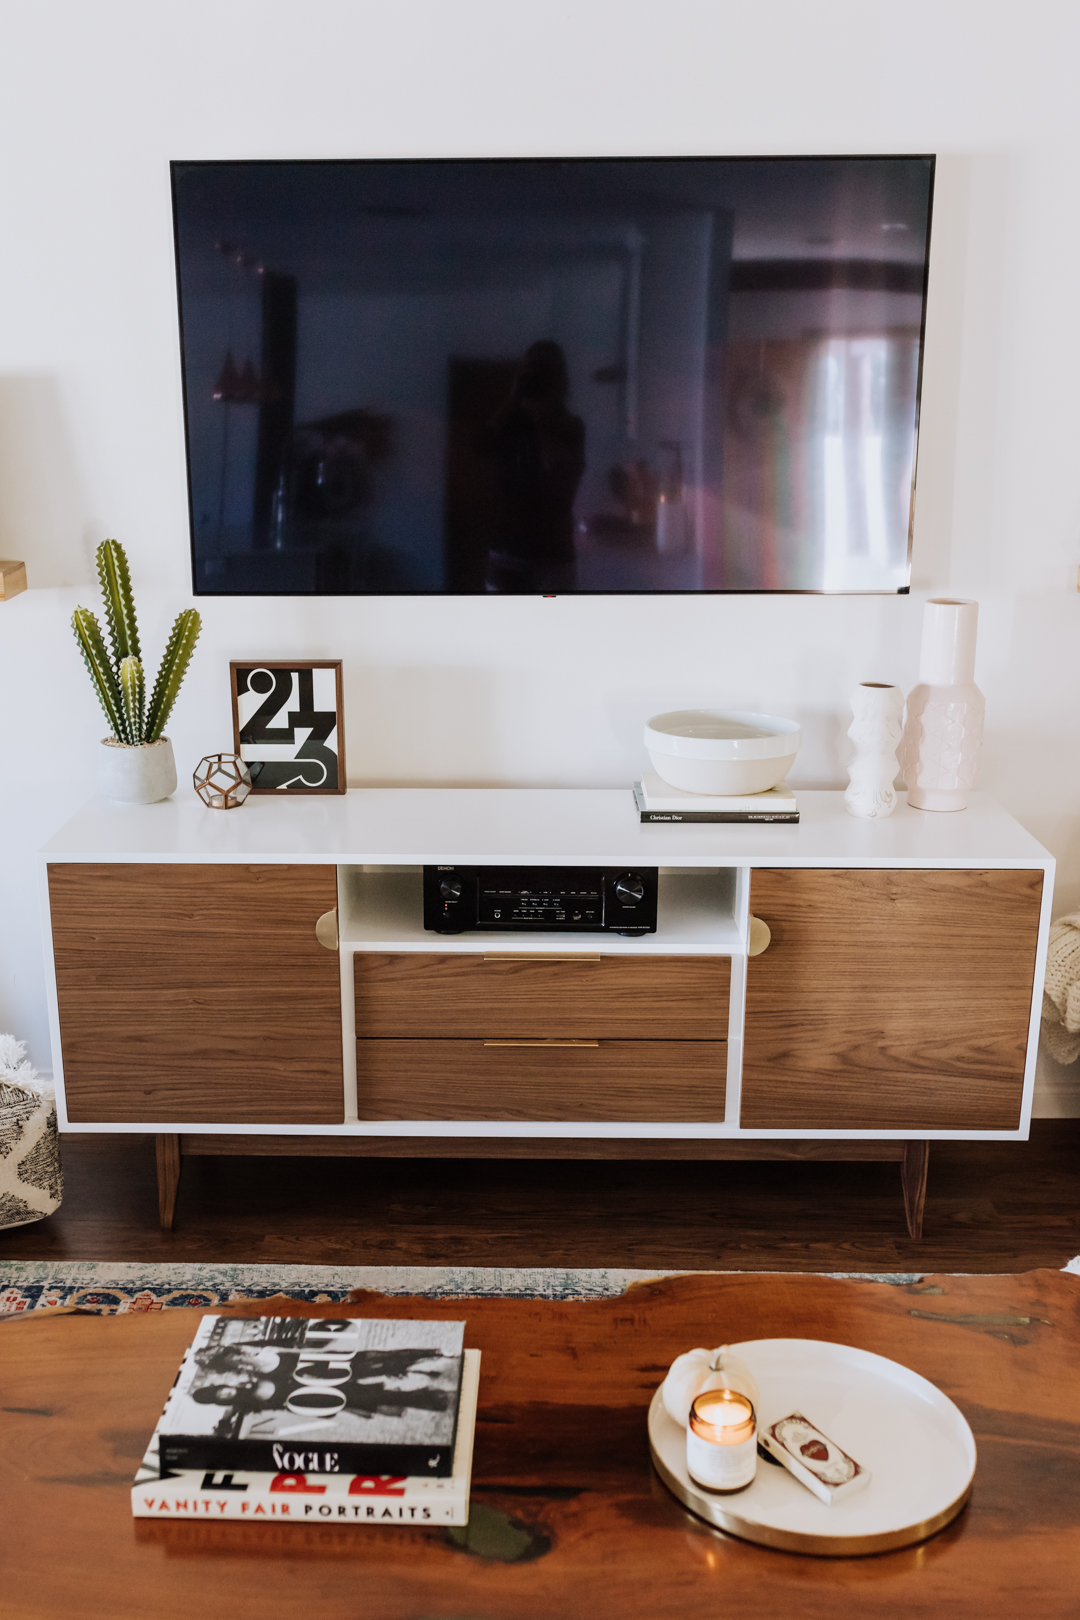 love this new custom media cabinet from draftwood designs in phoenix, az | thelovedesignedlife.com #theldlhome #livingroom #customfurniture #mediacabinet #midcenturymodern